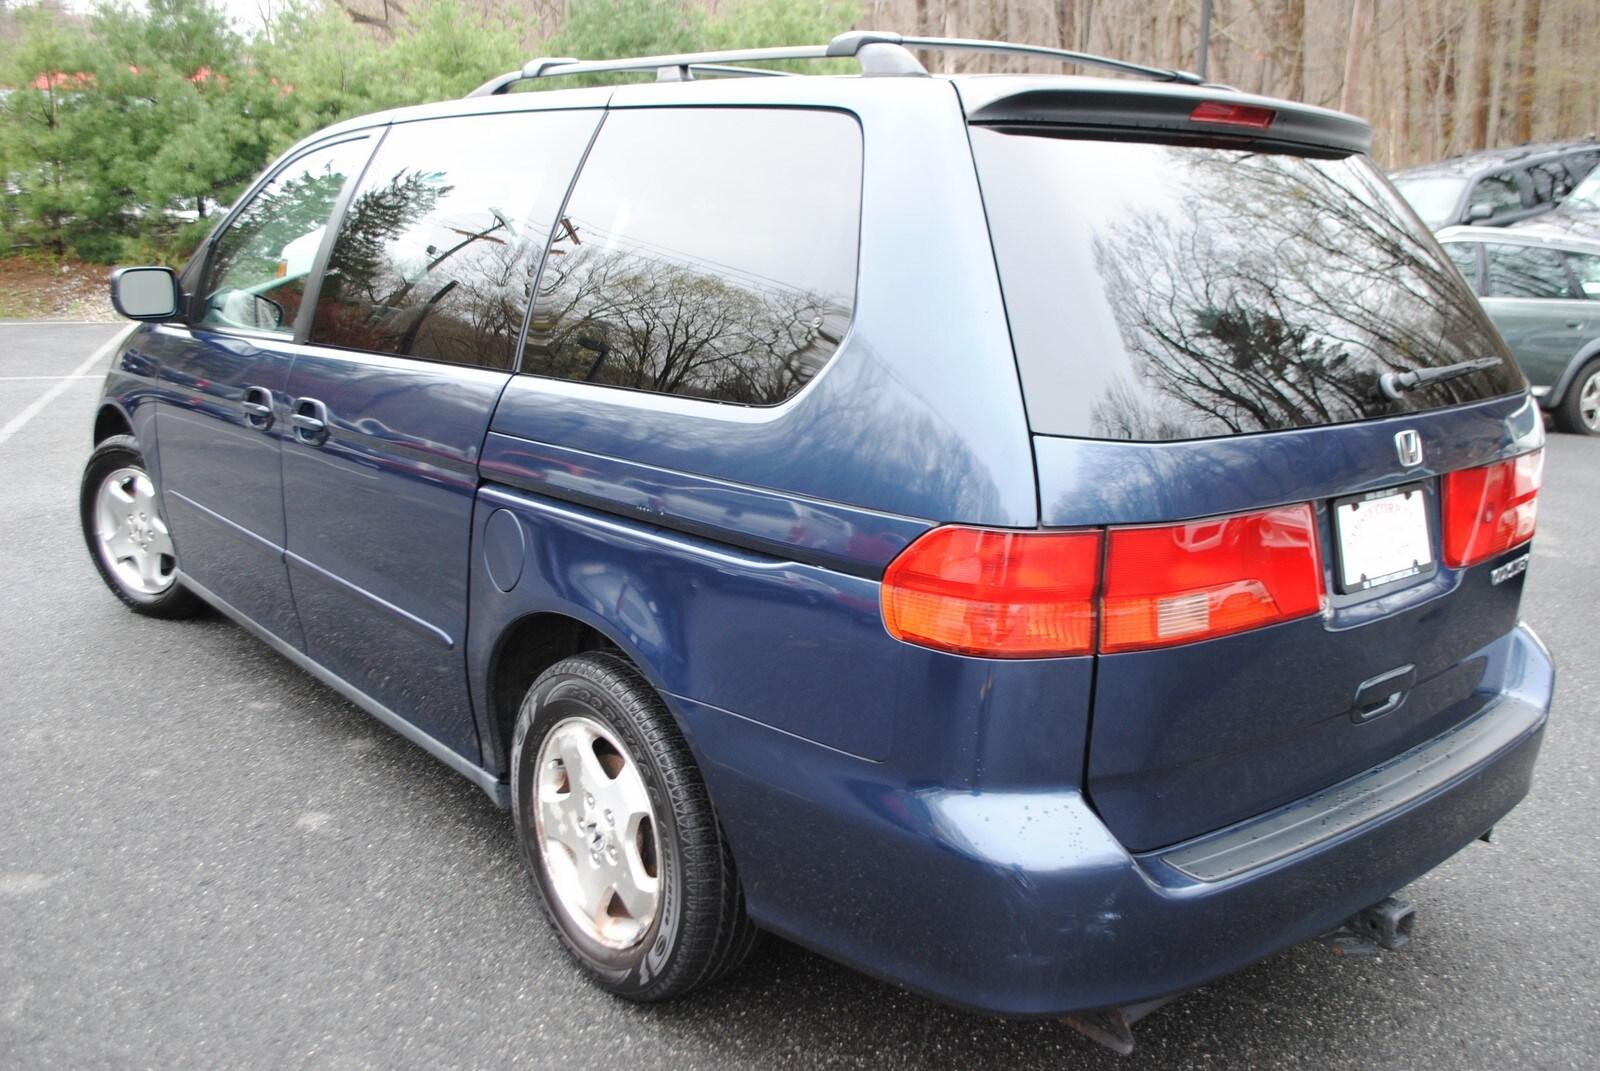 Used 1999 Honda Odyssey For Sale | West Milford NJ